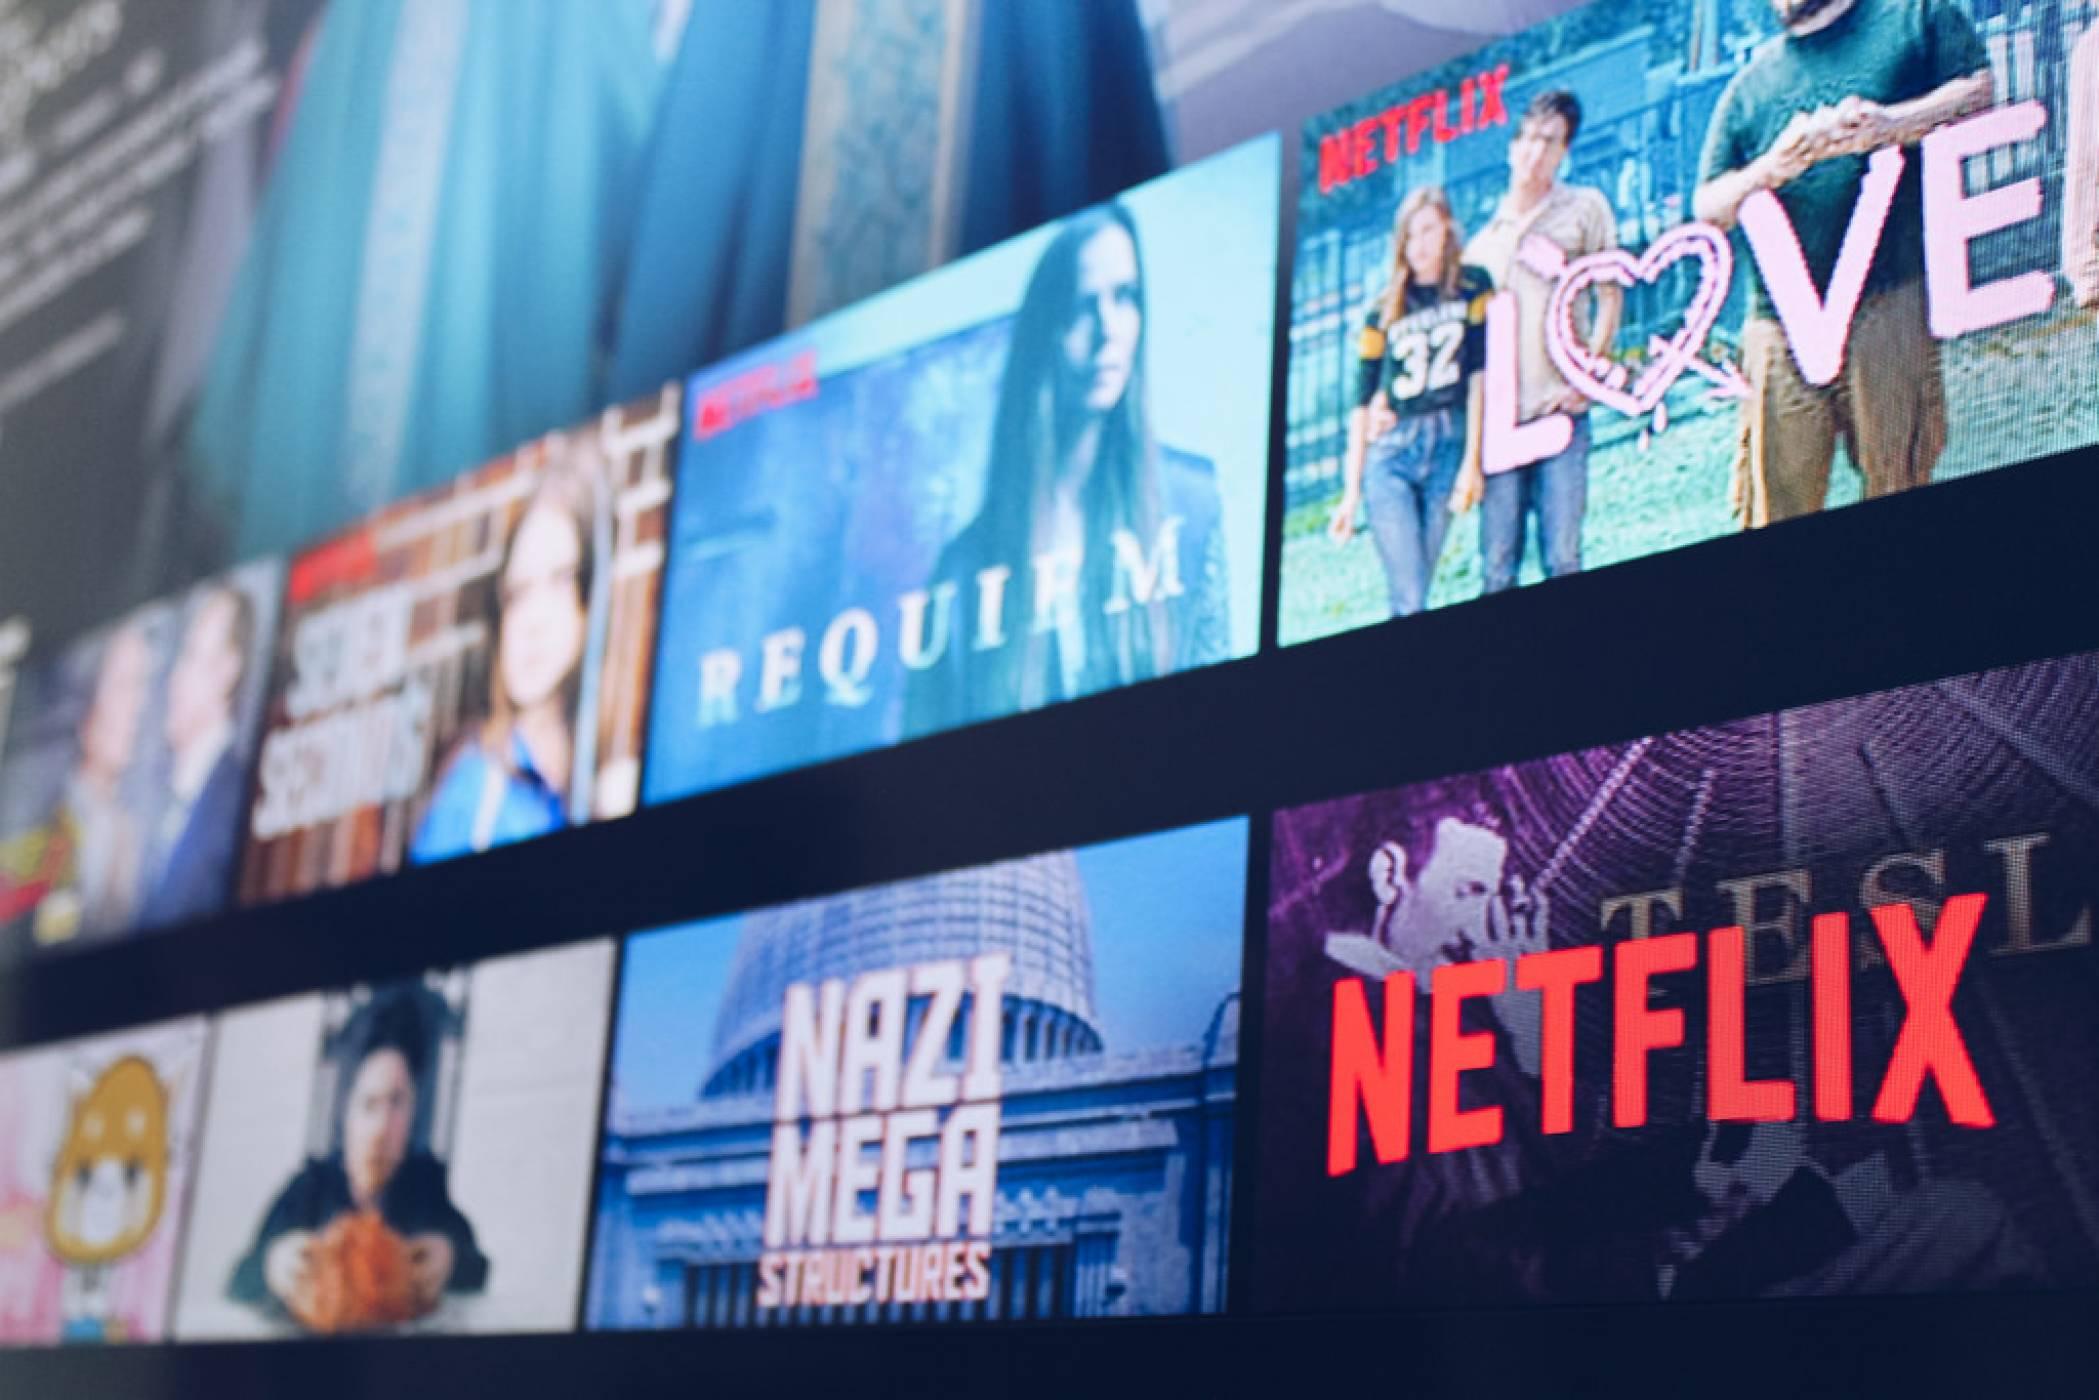 Roma на Netflix се готви да пише история с рекордните десет номинации за